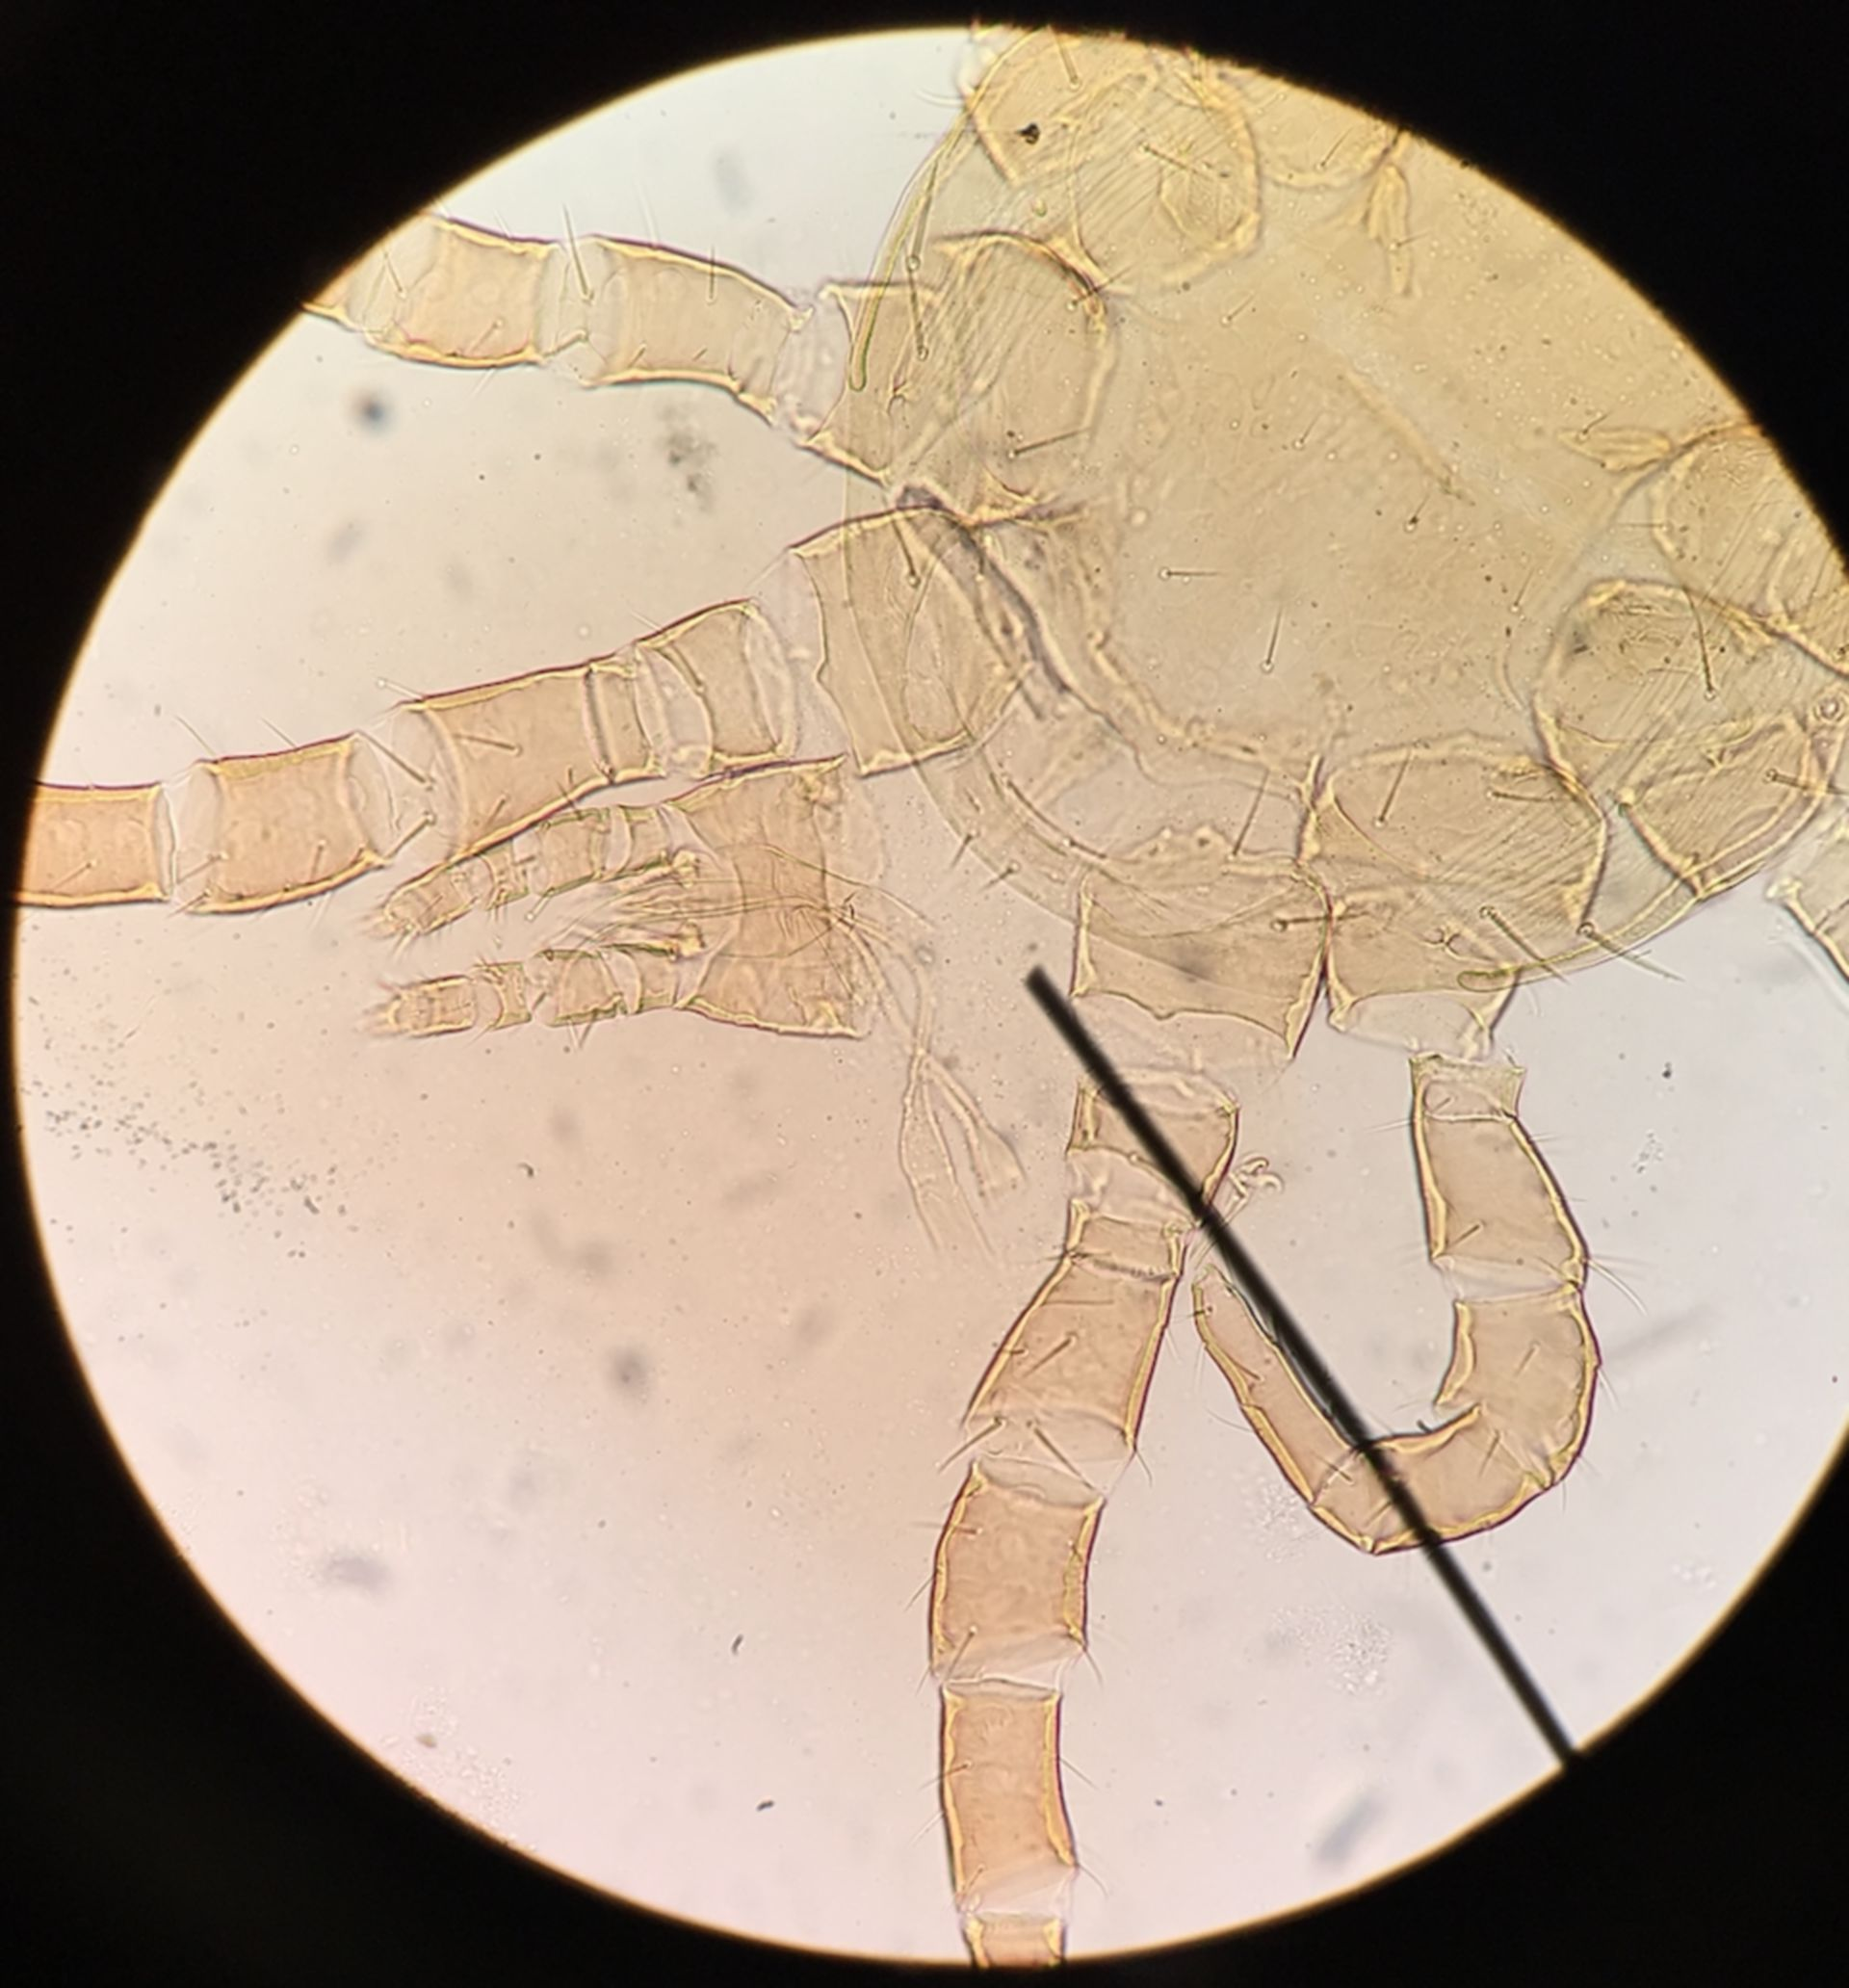 Dermanyssus gallinae (2/3)